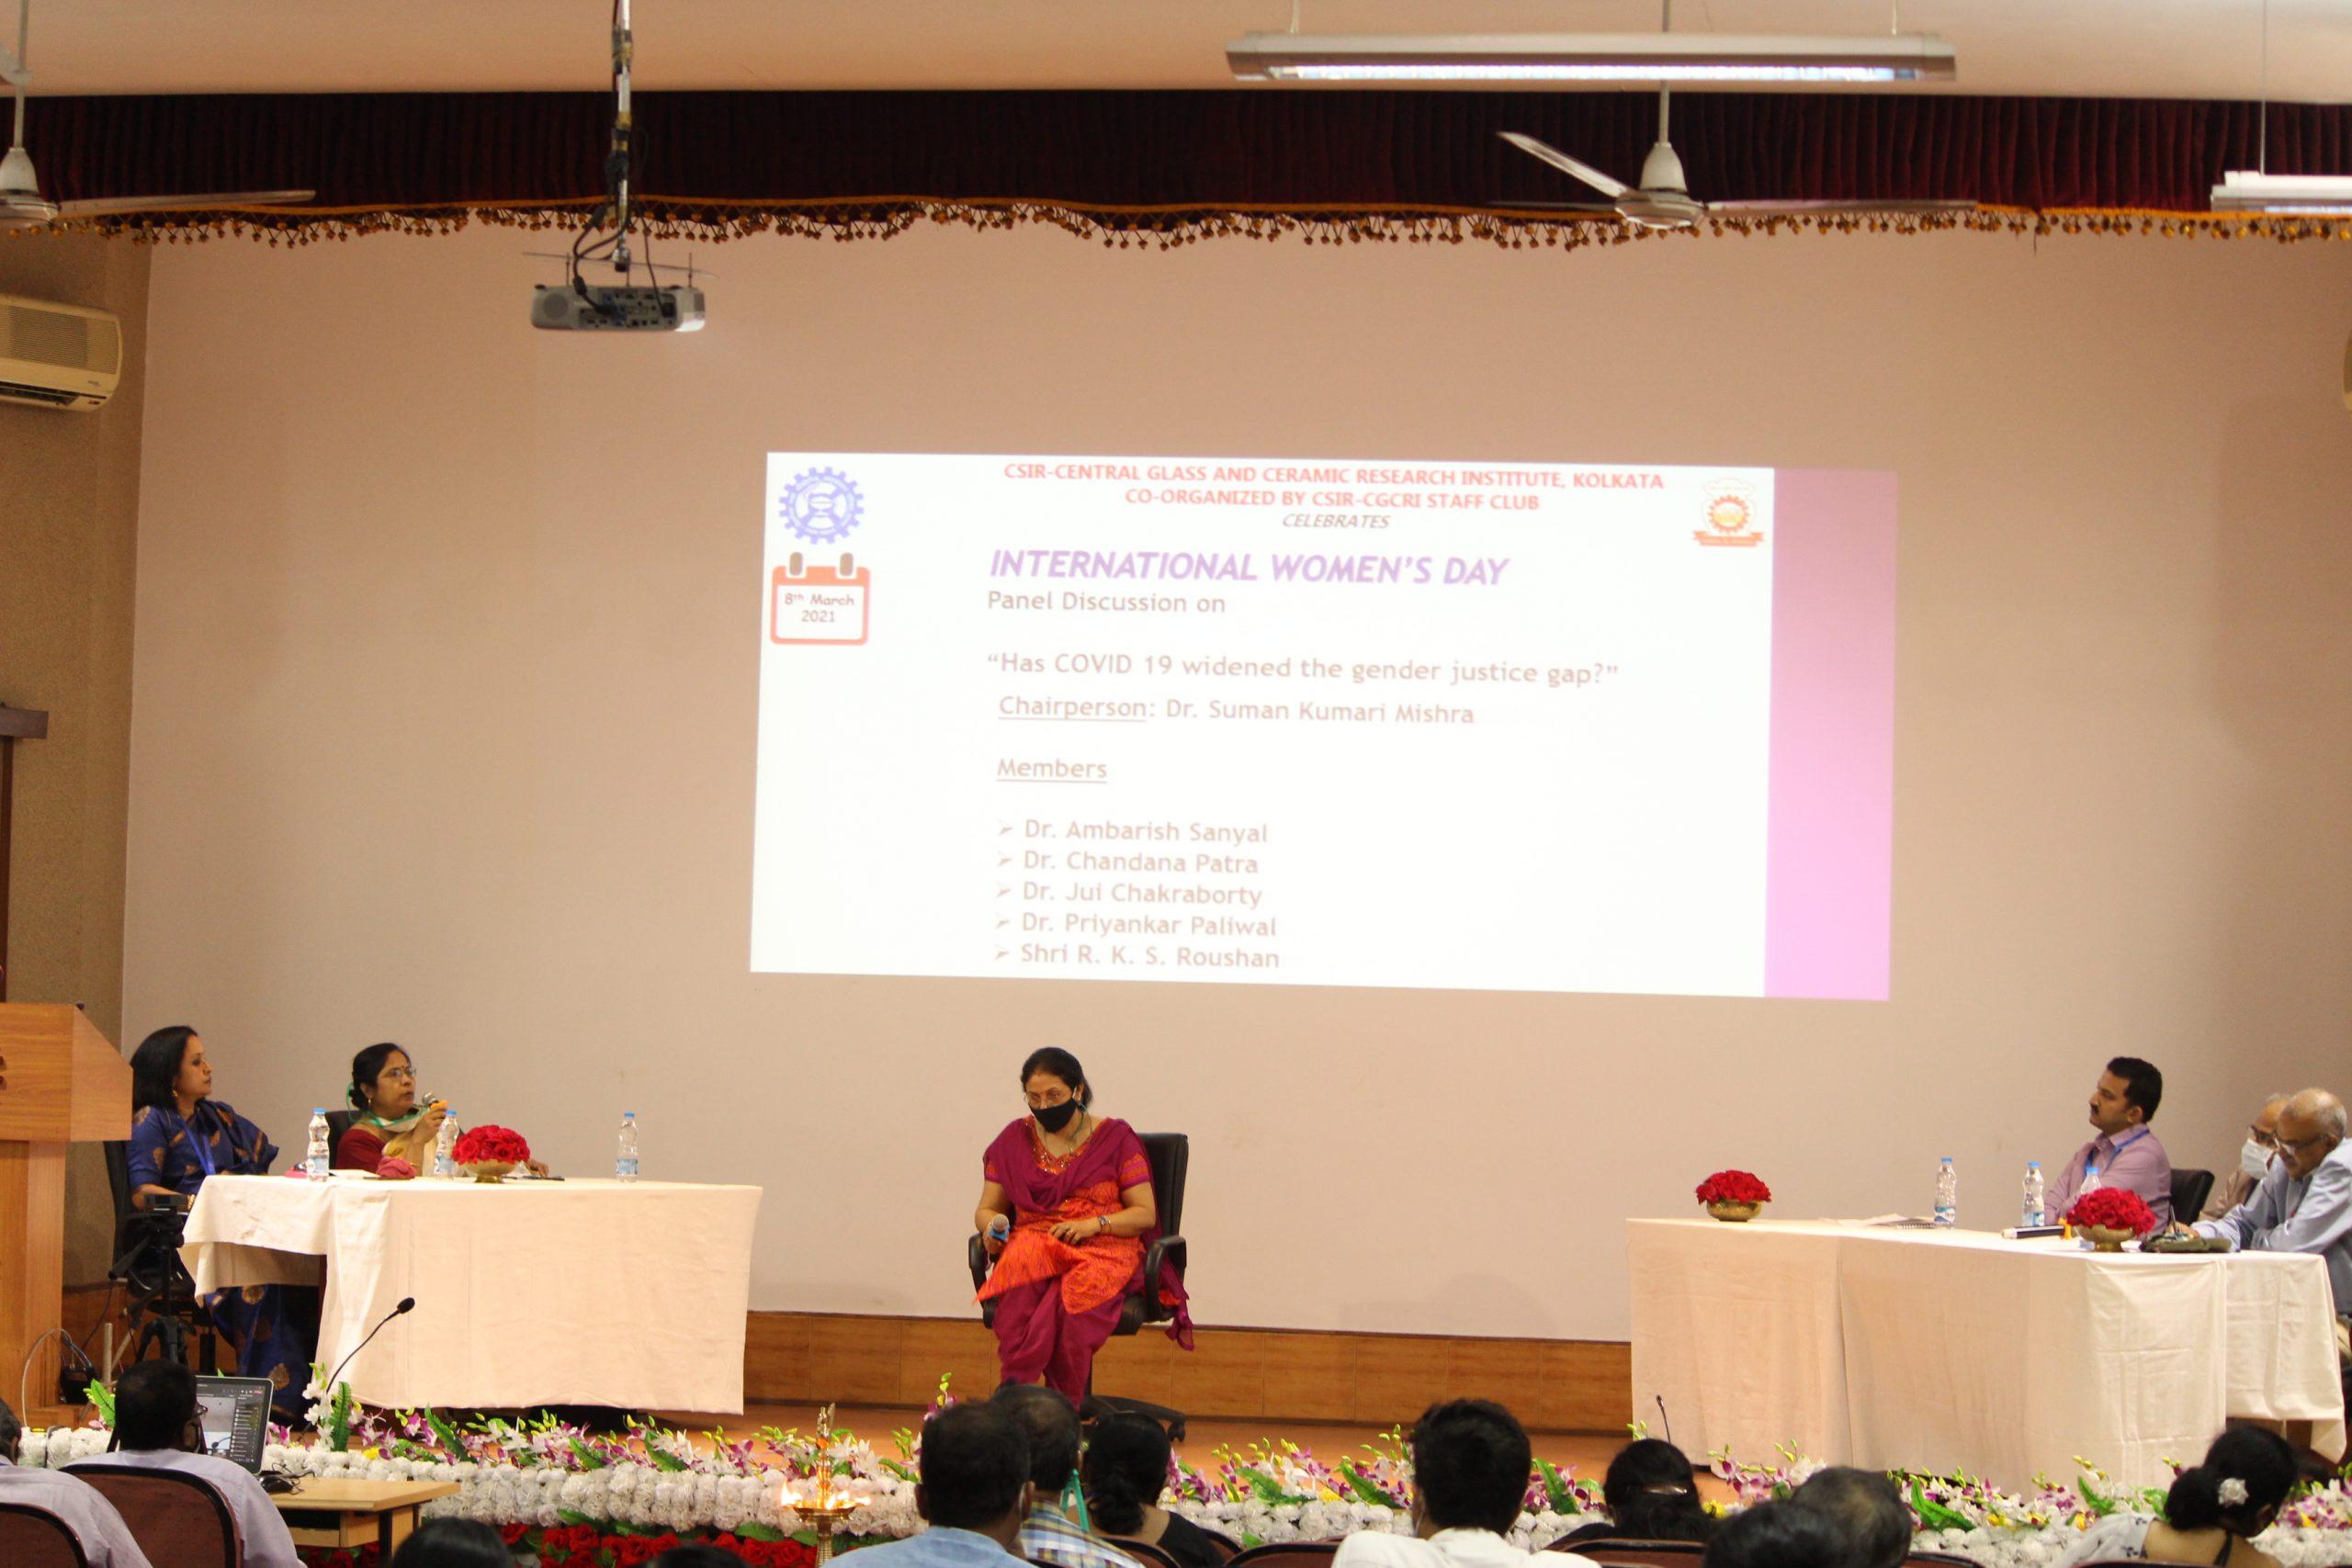 Panel discussion. Clockwise from left. Dr Jui Chakraborty, Dr Chandana Patra, Dr Suman K. Mishra (Director), Dr Ambarish Sanyal, Dr Priyankar Paliawal and Shri Rajesh Kumar Singh Roushan.